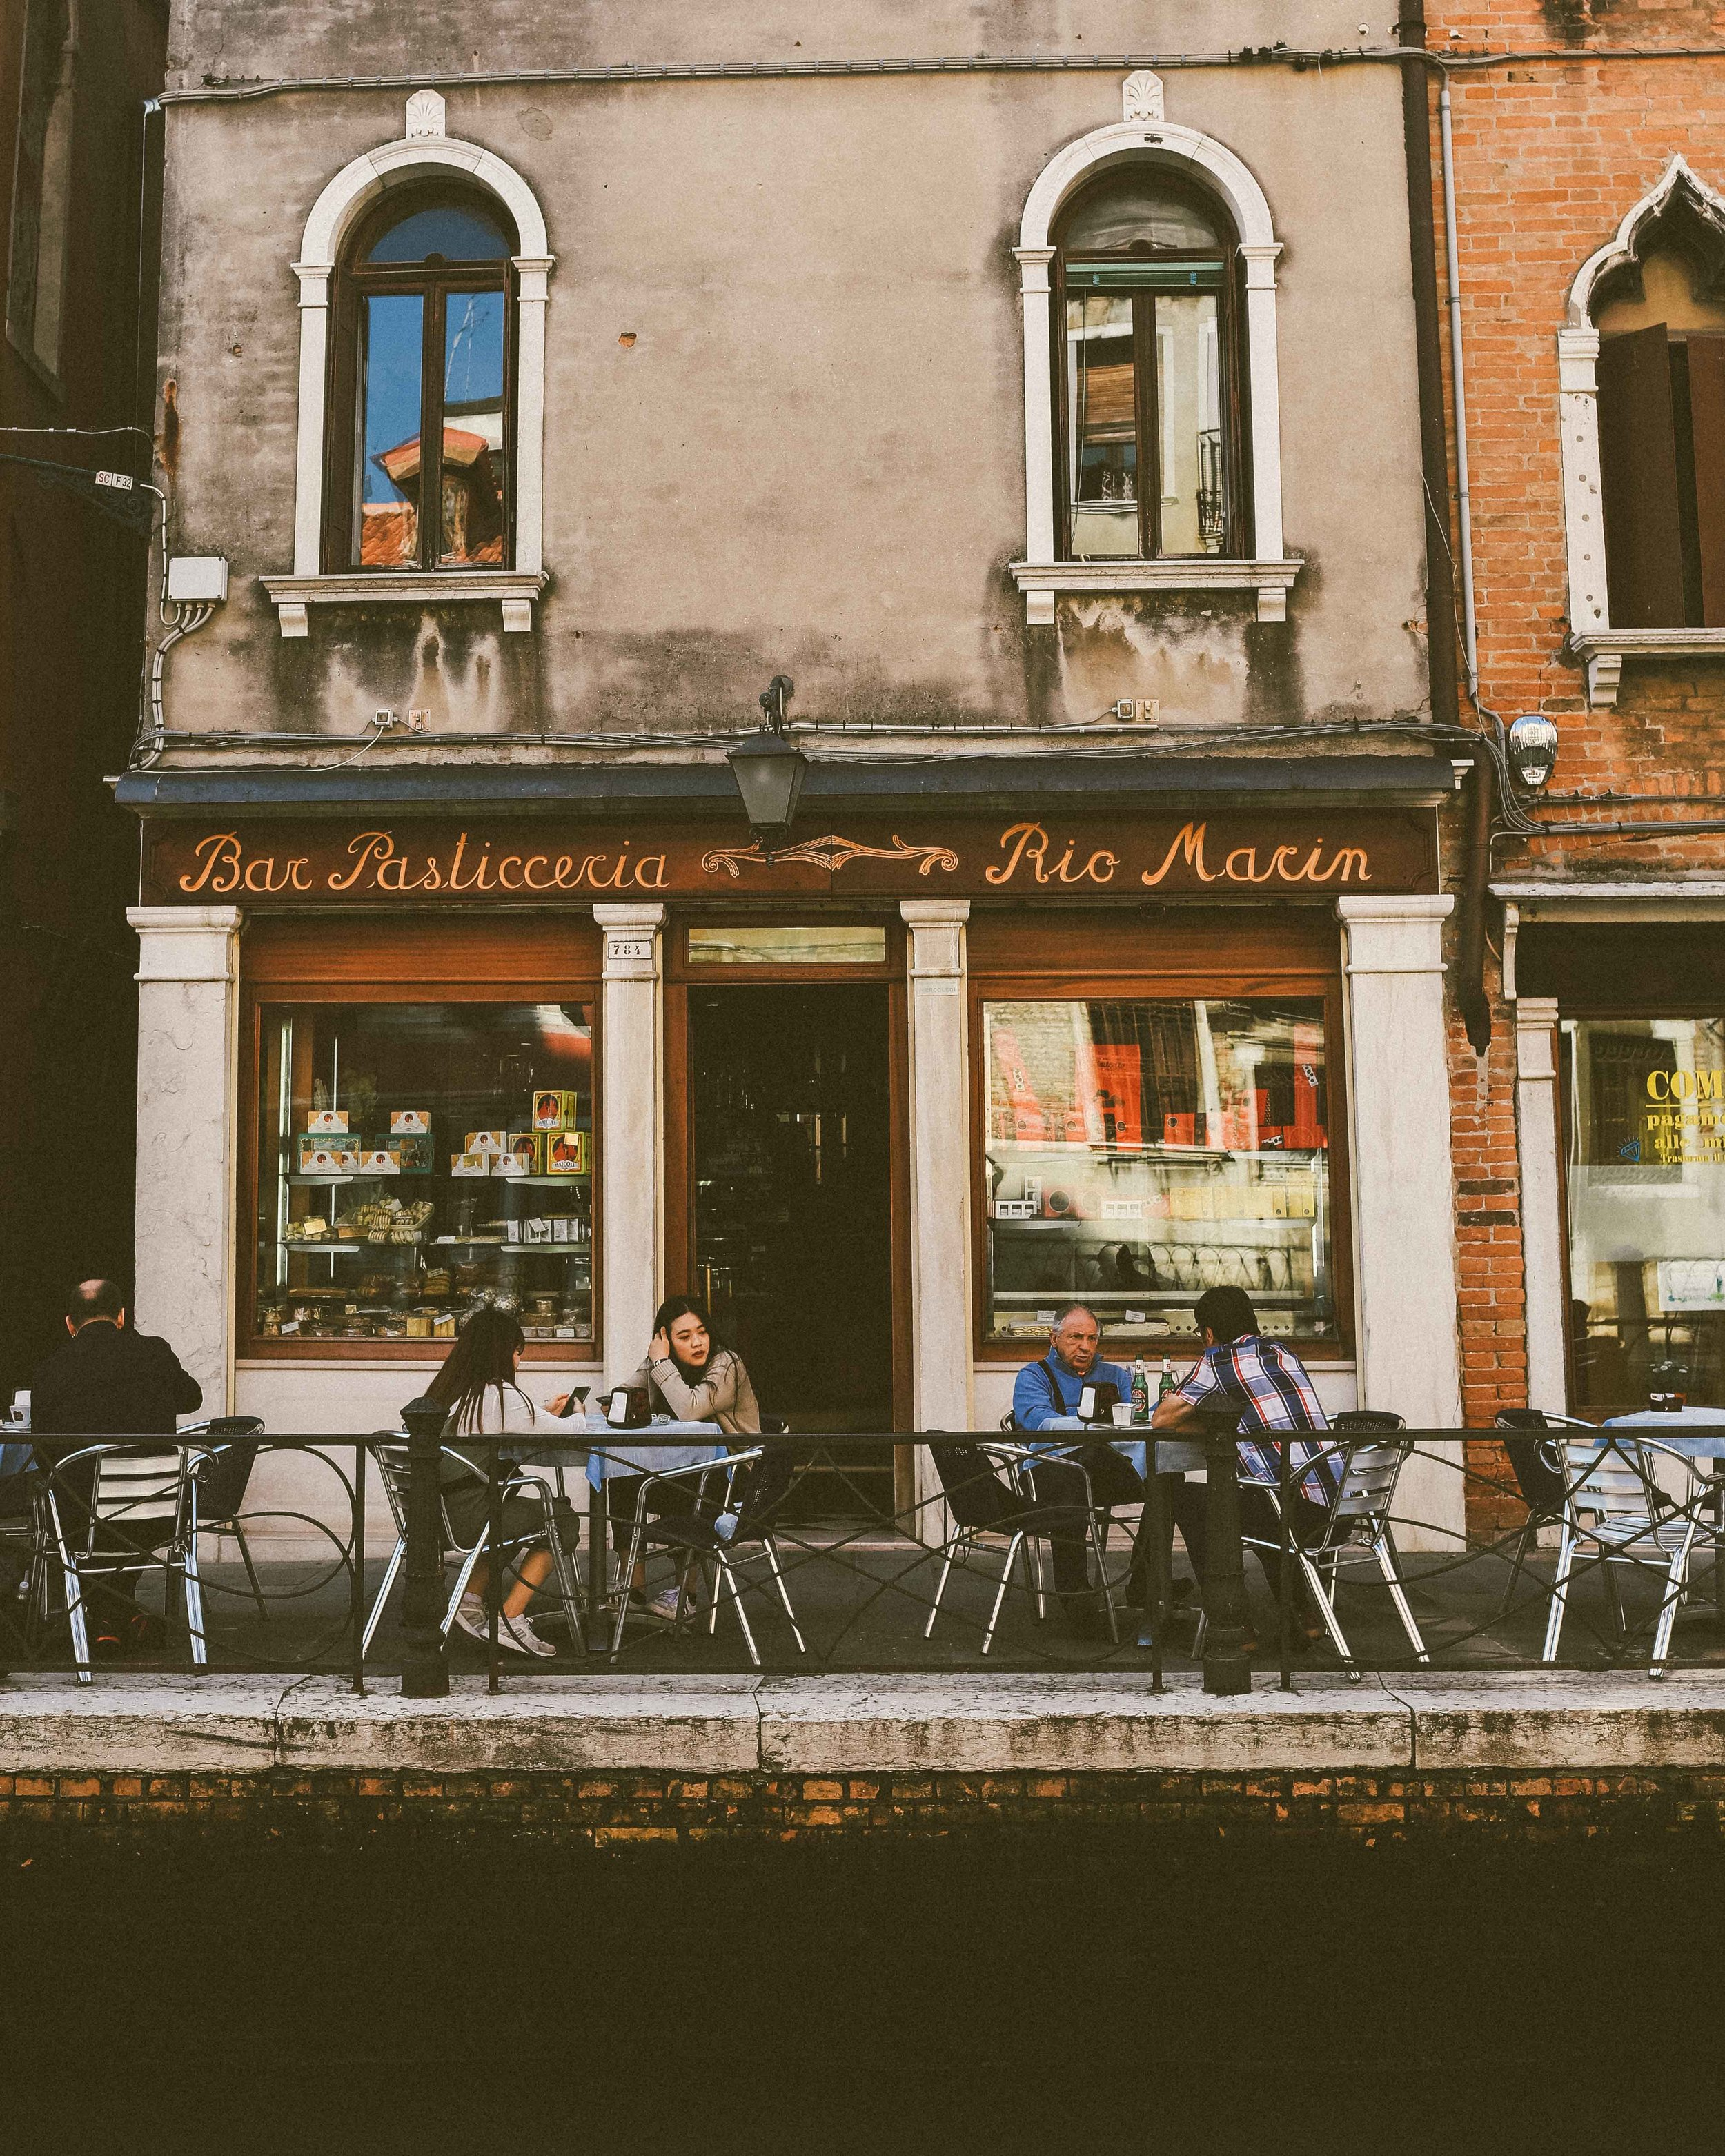 Street_Photographer_Venice_Italy_1.jpg